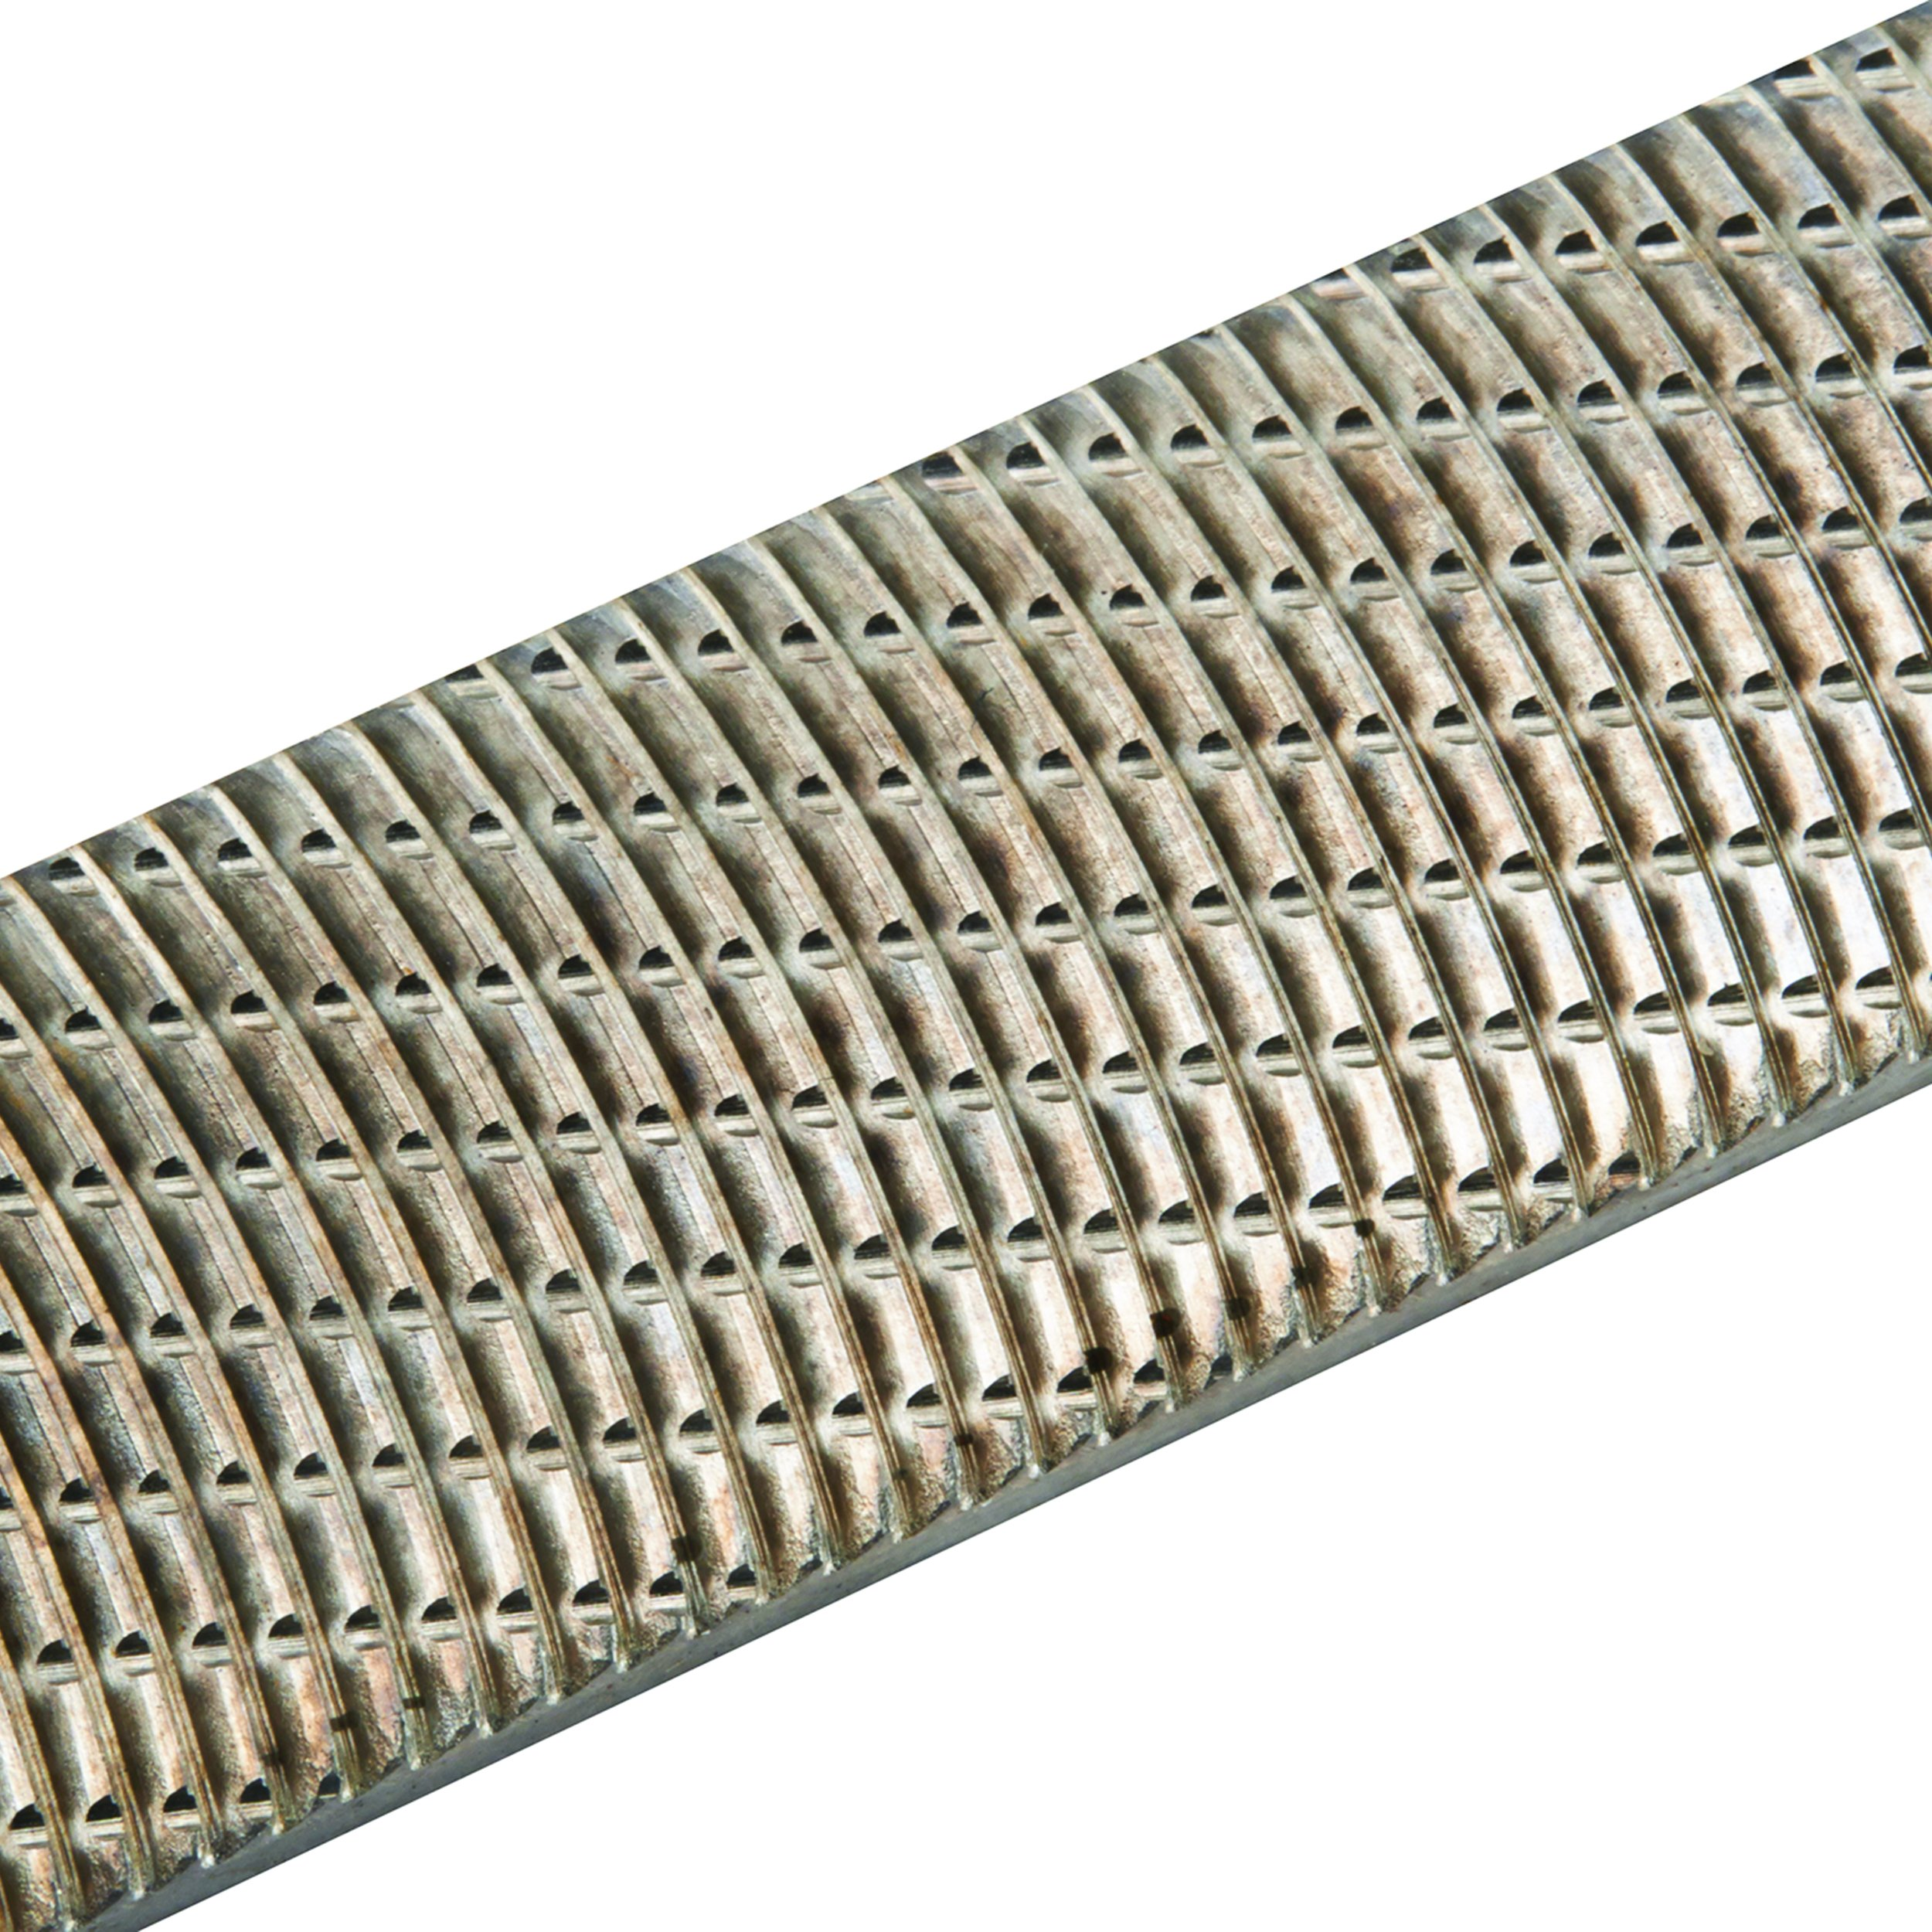 Iwasaki File 150mm Flat Extreme-Fine Cut by Iwasaki (Image #2)